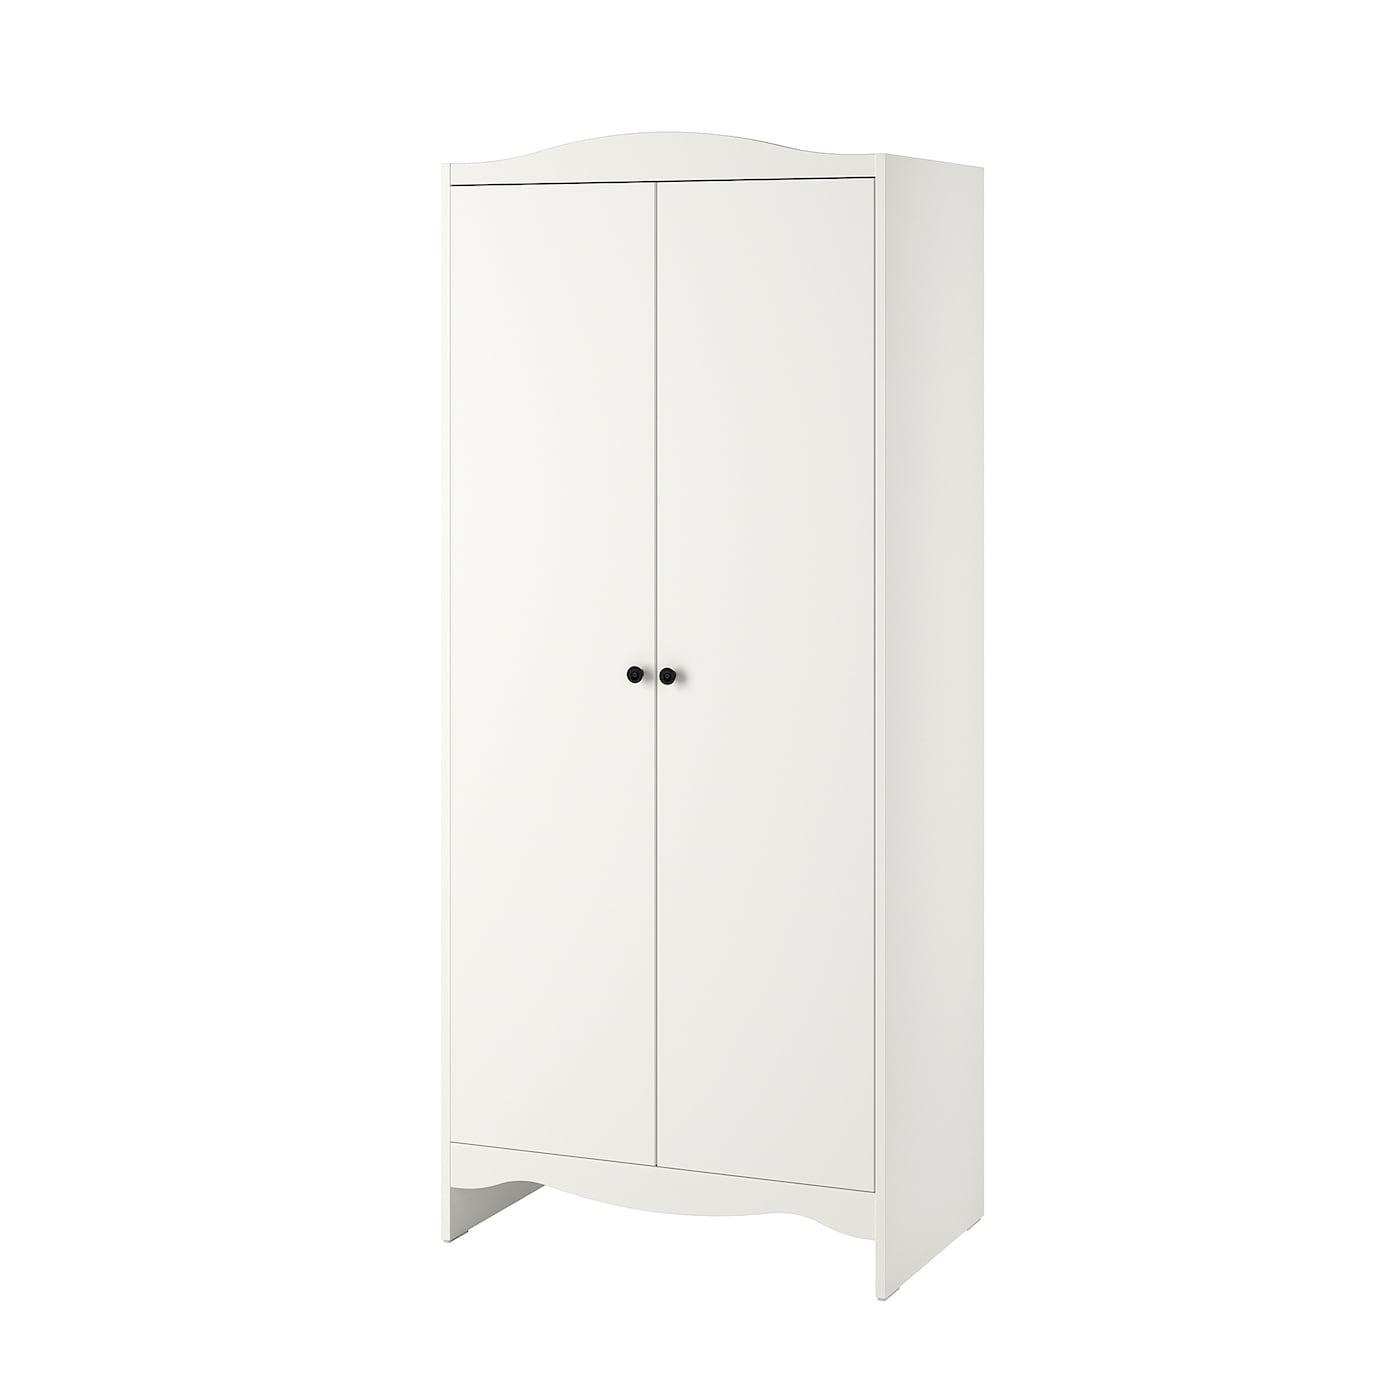 IKEA SMÅGÖRA Szafa, biały, 80x50x187 cm